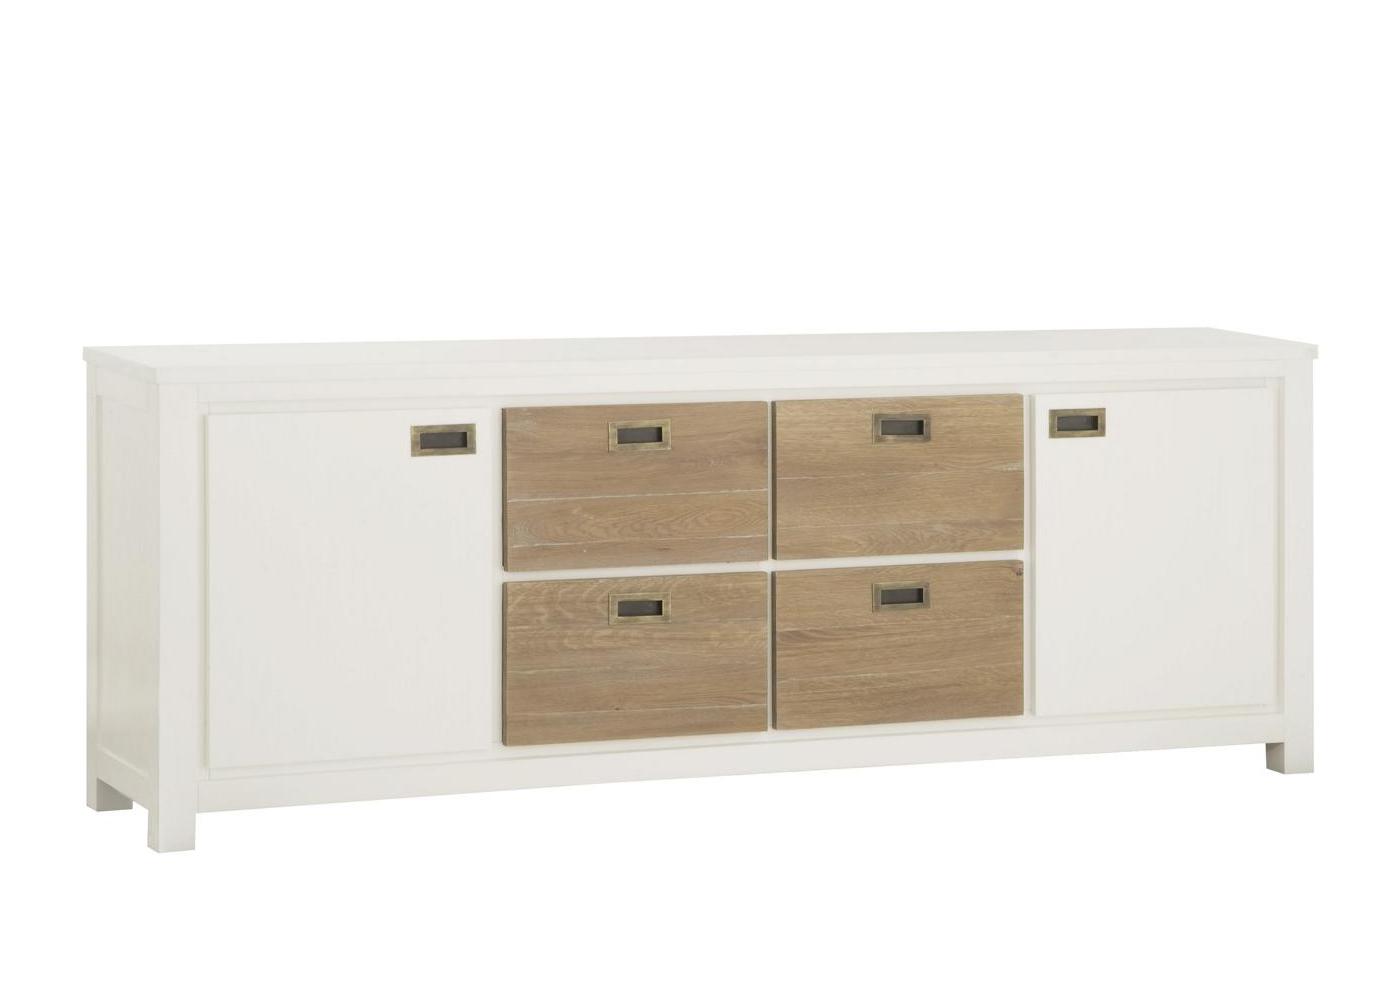 tv dressoir 210 x 42 x 77 h cm u20ac 896 00 extra lange dressoir ...